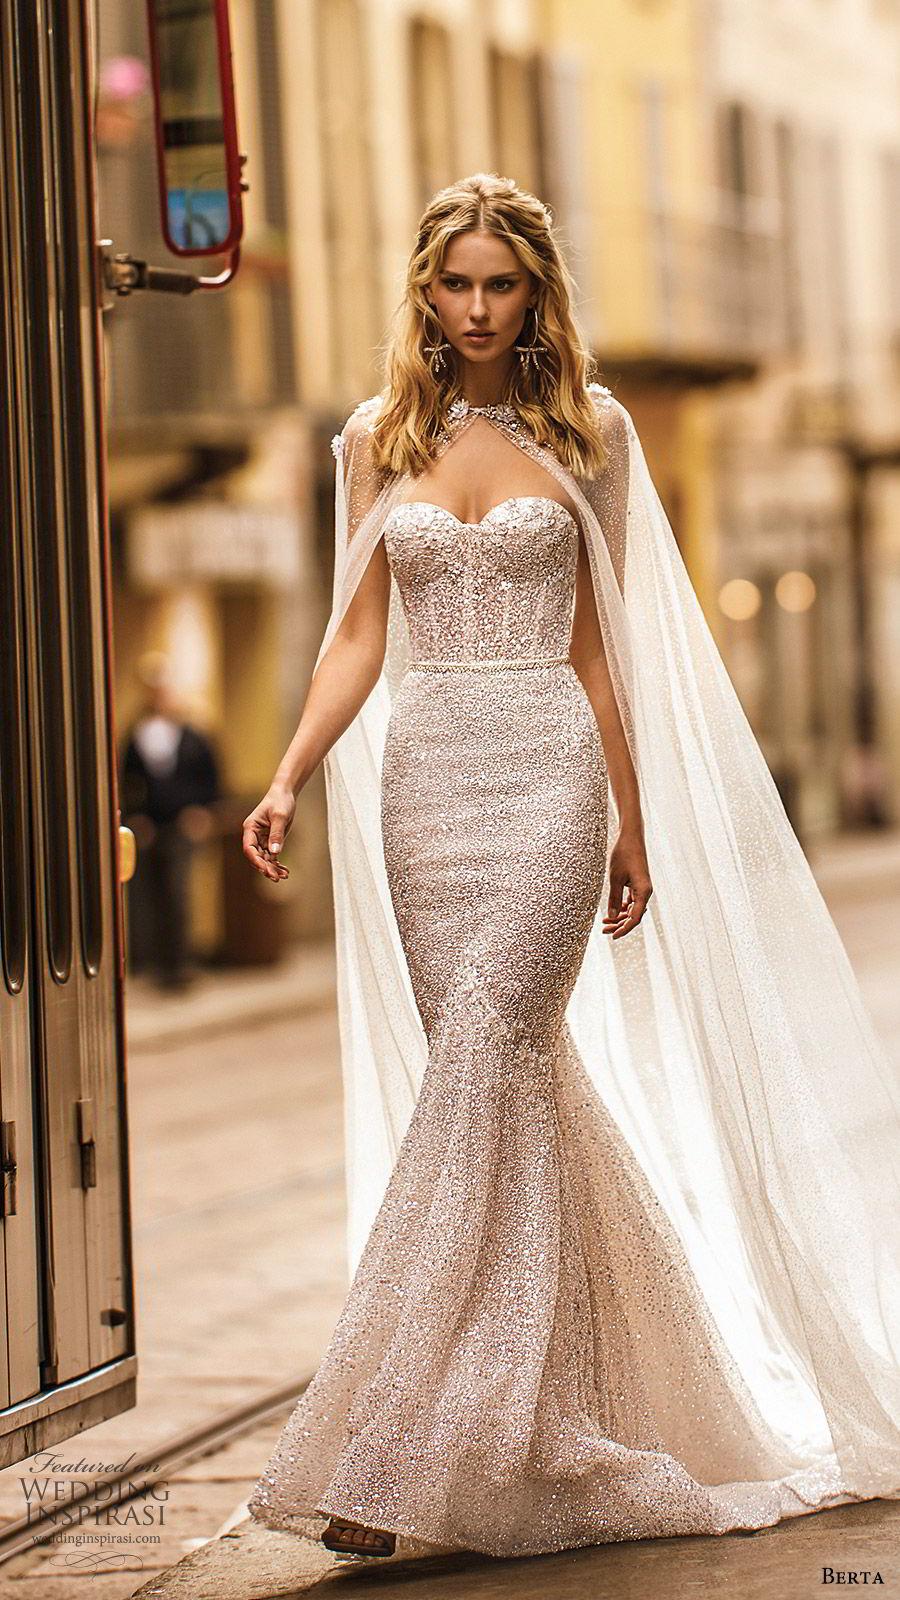 berta spring 2020 bridal strapless sweetheart fully embellished mermaid sheath wedding dress (16) glitzy elegant sheer back chapel train sheer cape bv